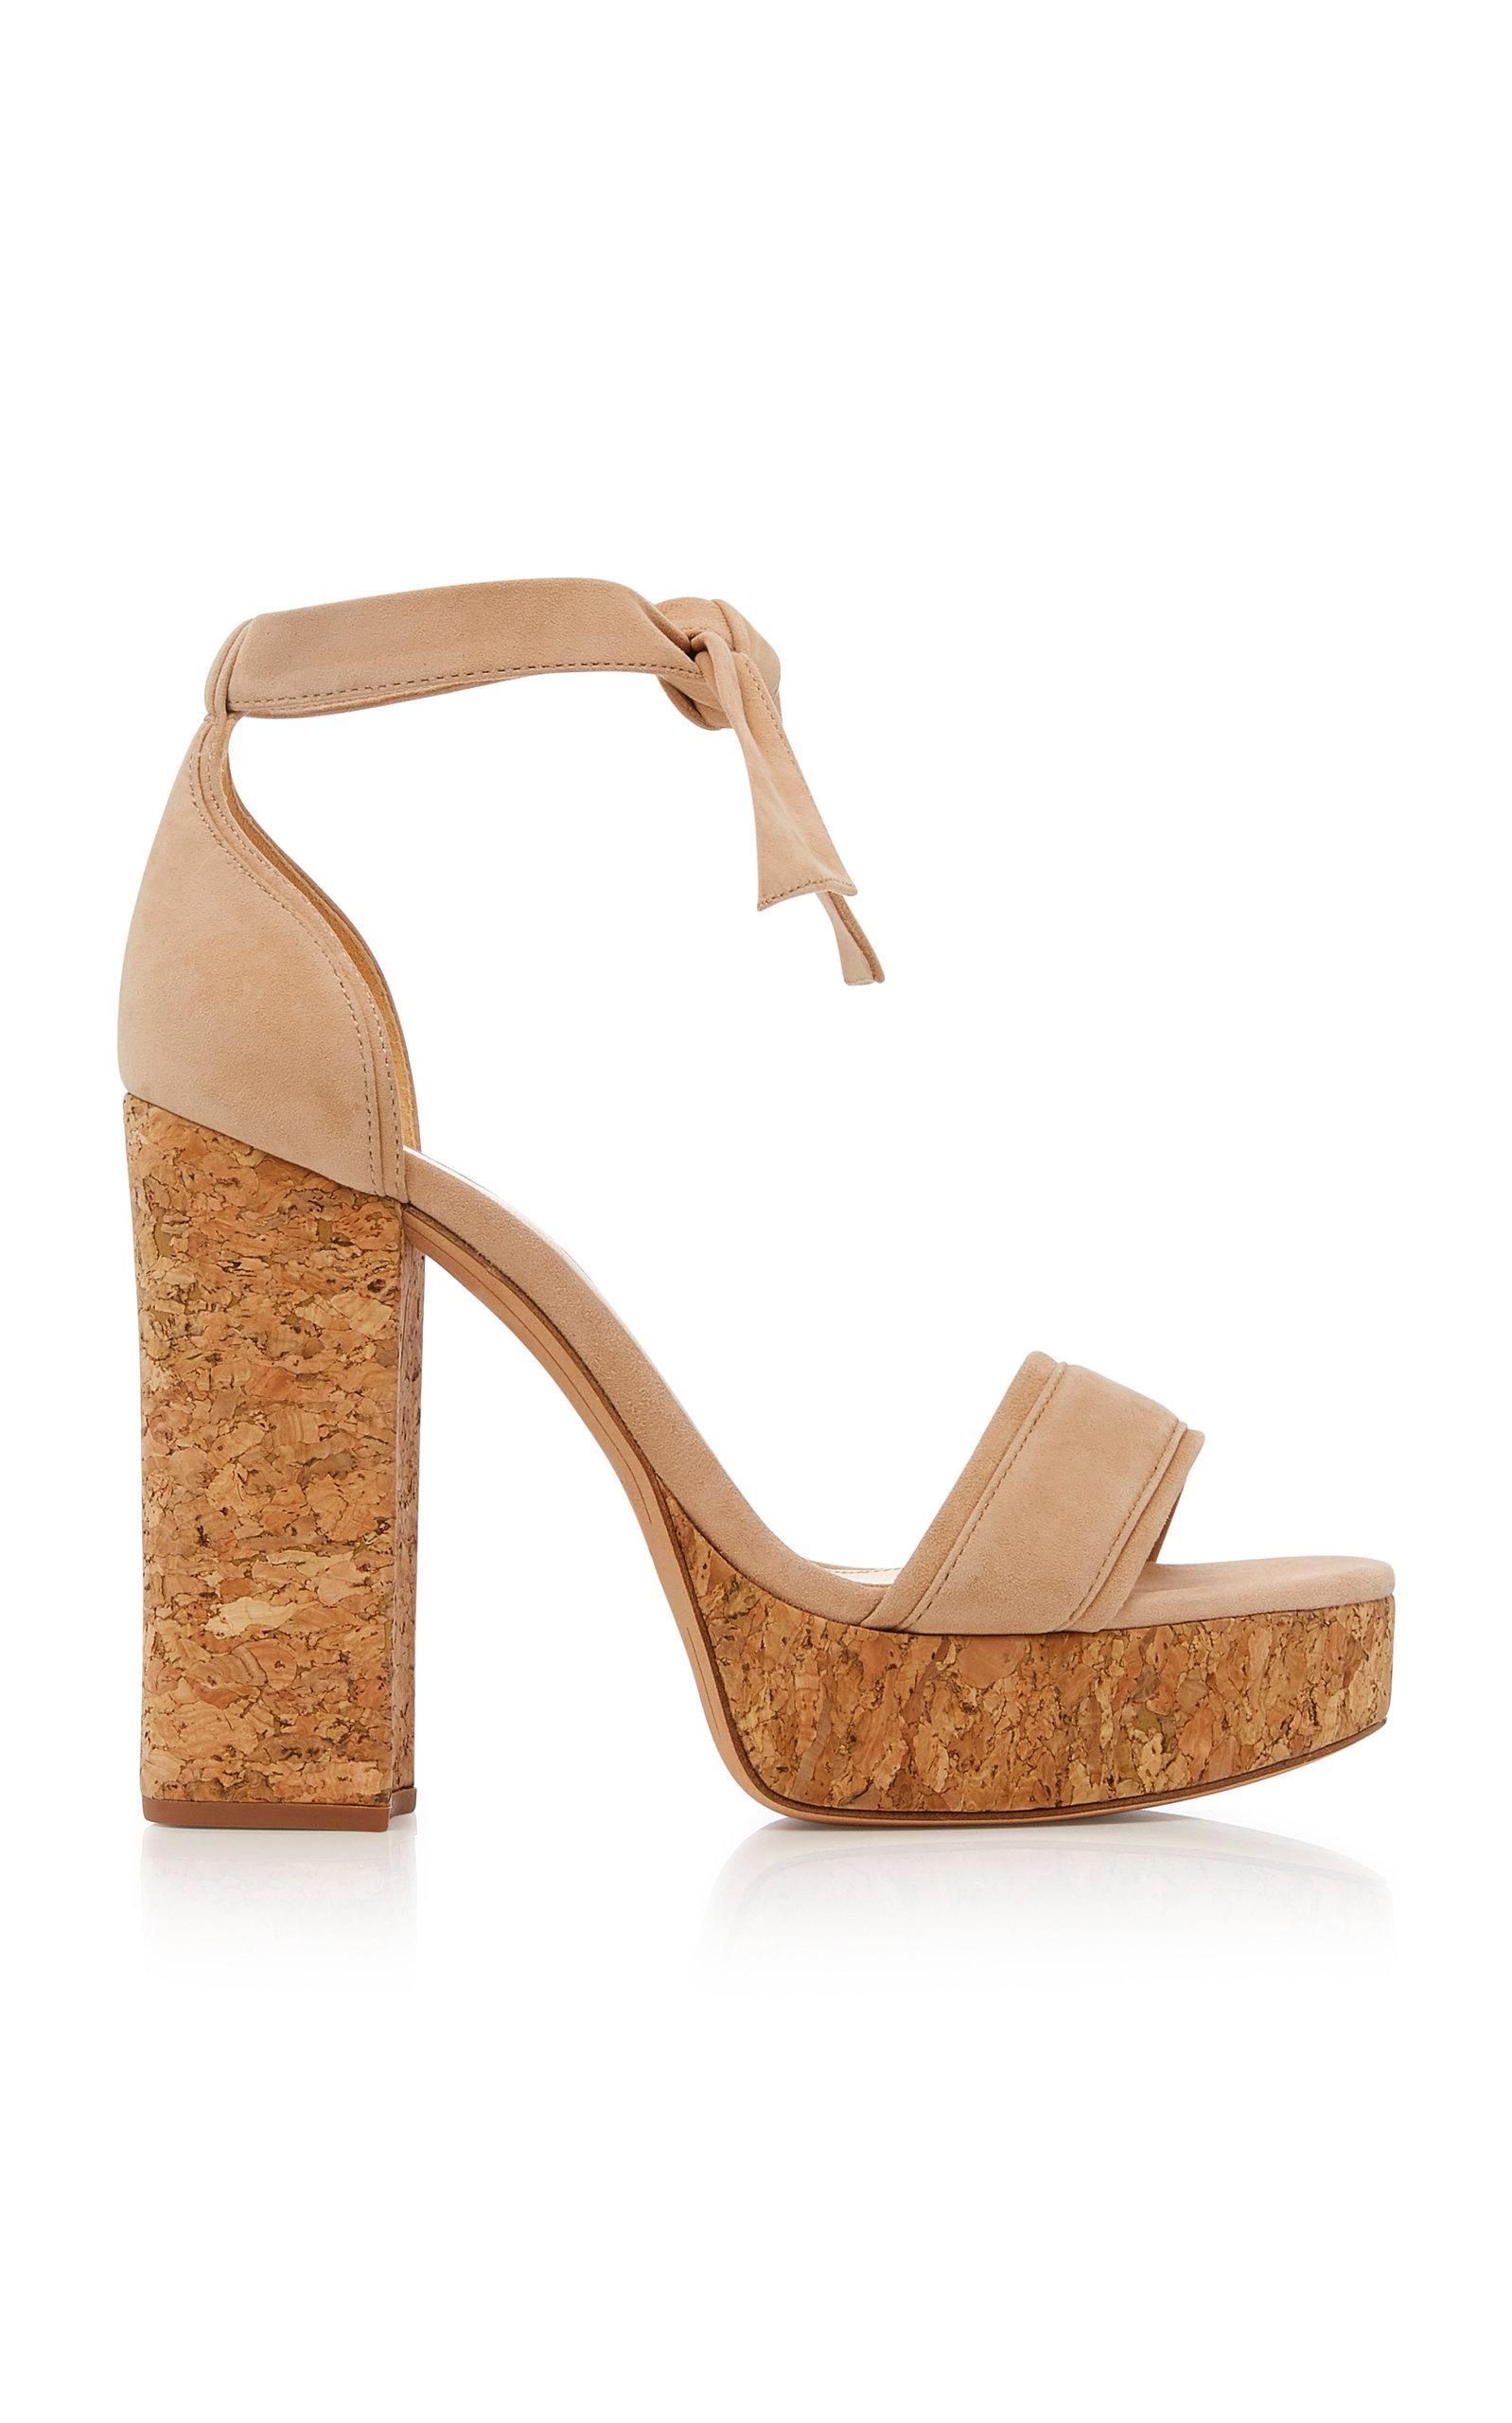 fce7b05b6c2 Lyst - Alexandre Birman Celine Platform Suede Sandals